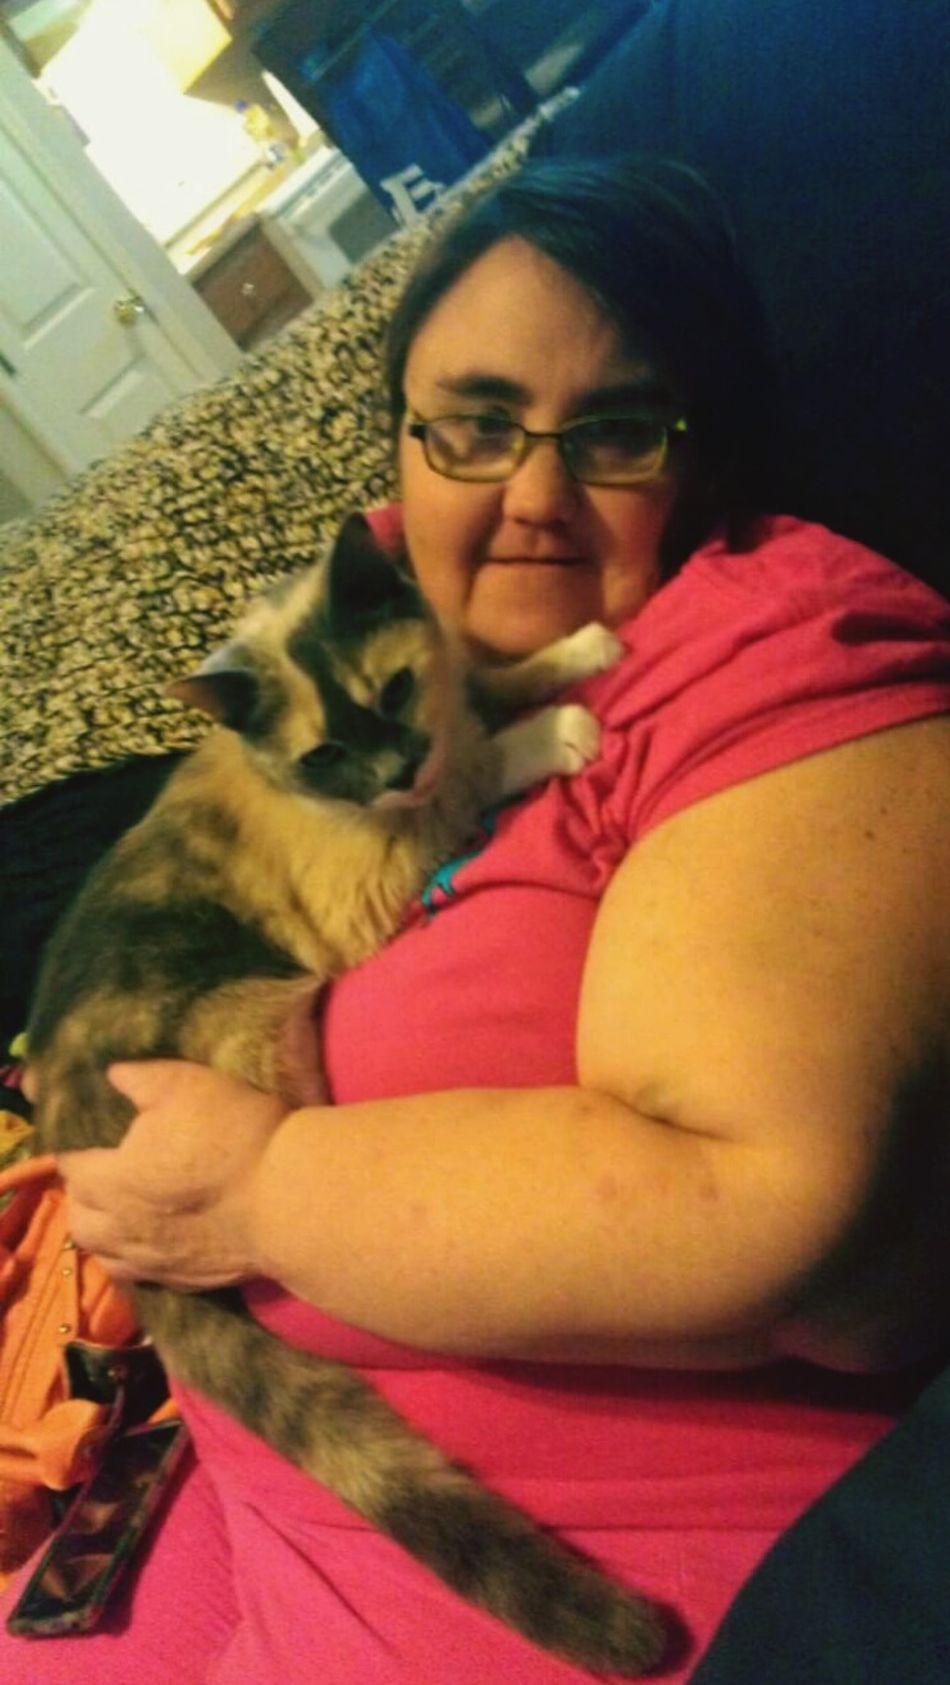 Selfie ✌ BL Eyeem Animal LAnimal Cute Pets Playing With The AnPlaying